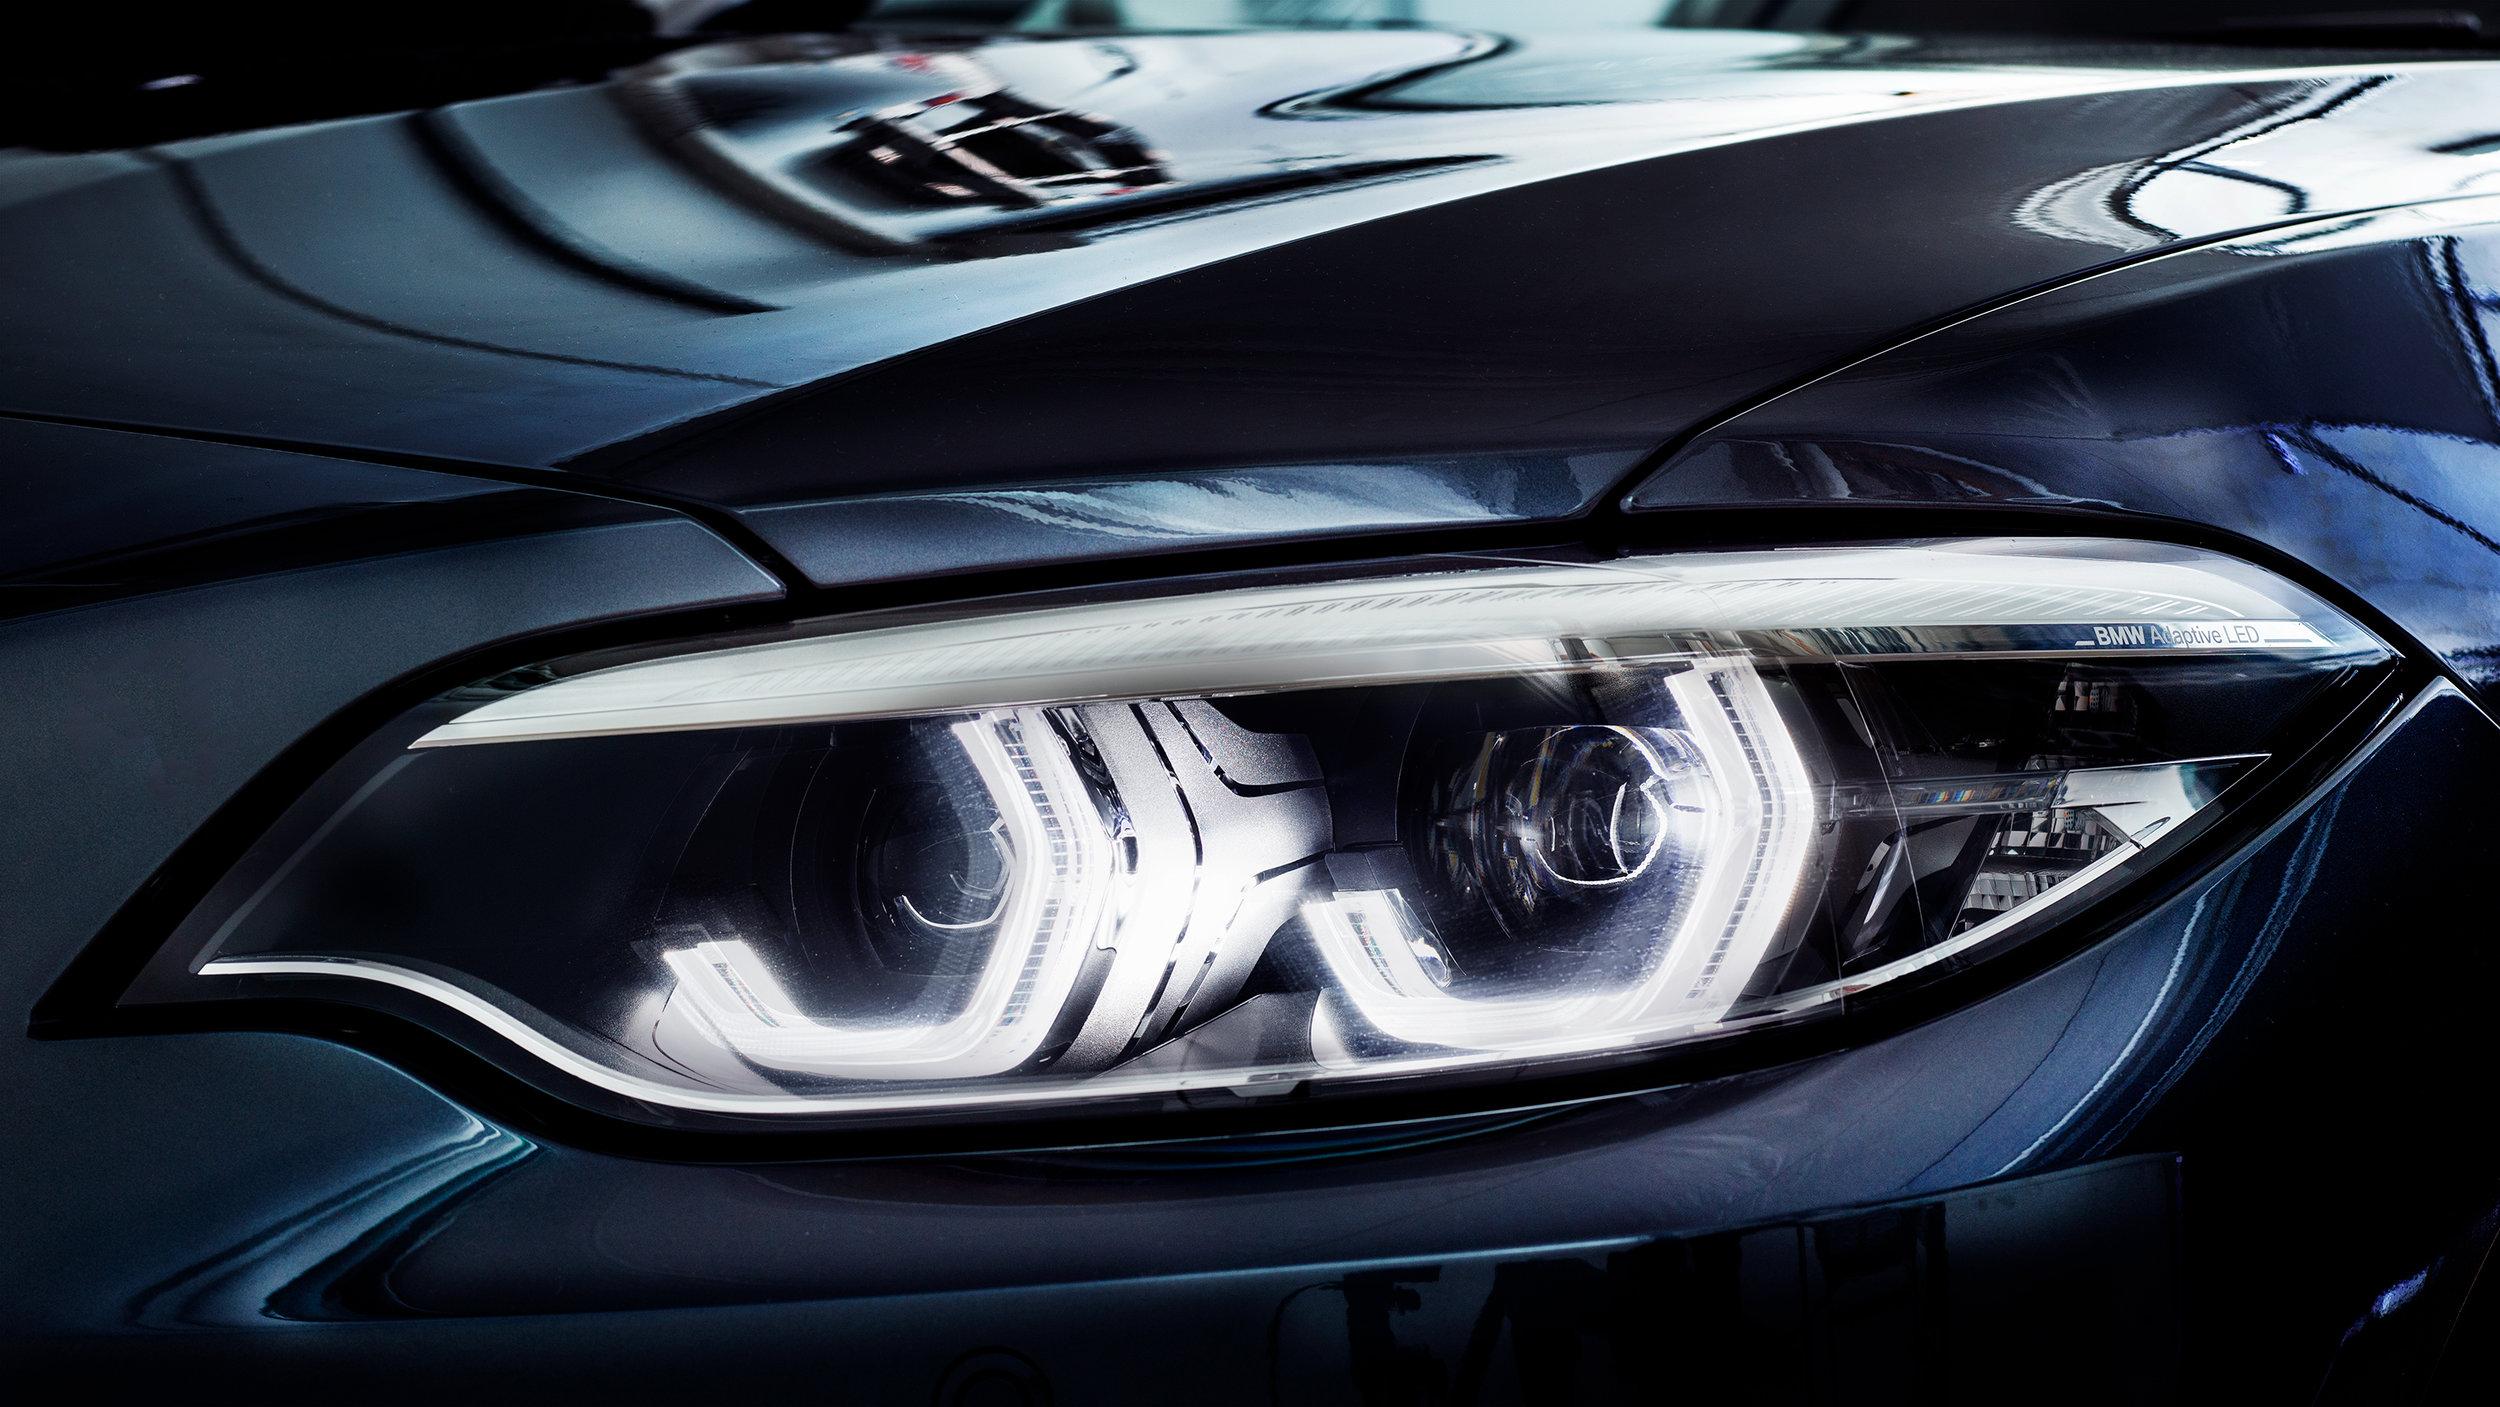 test-headlights-01psd-copy.jpg